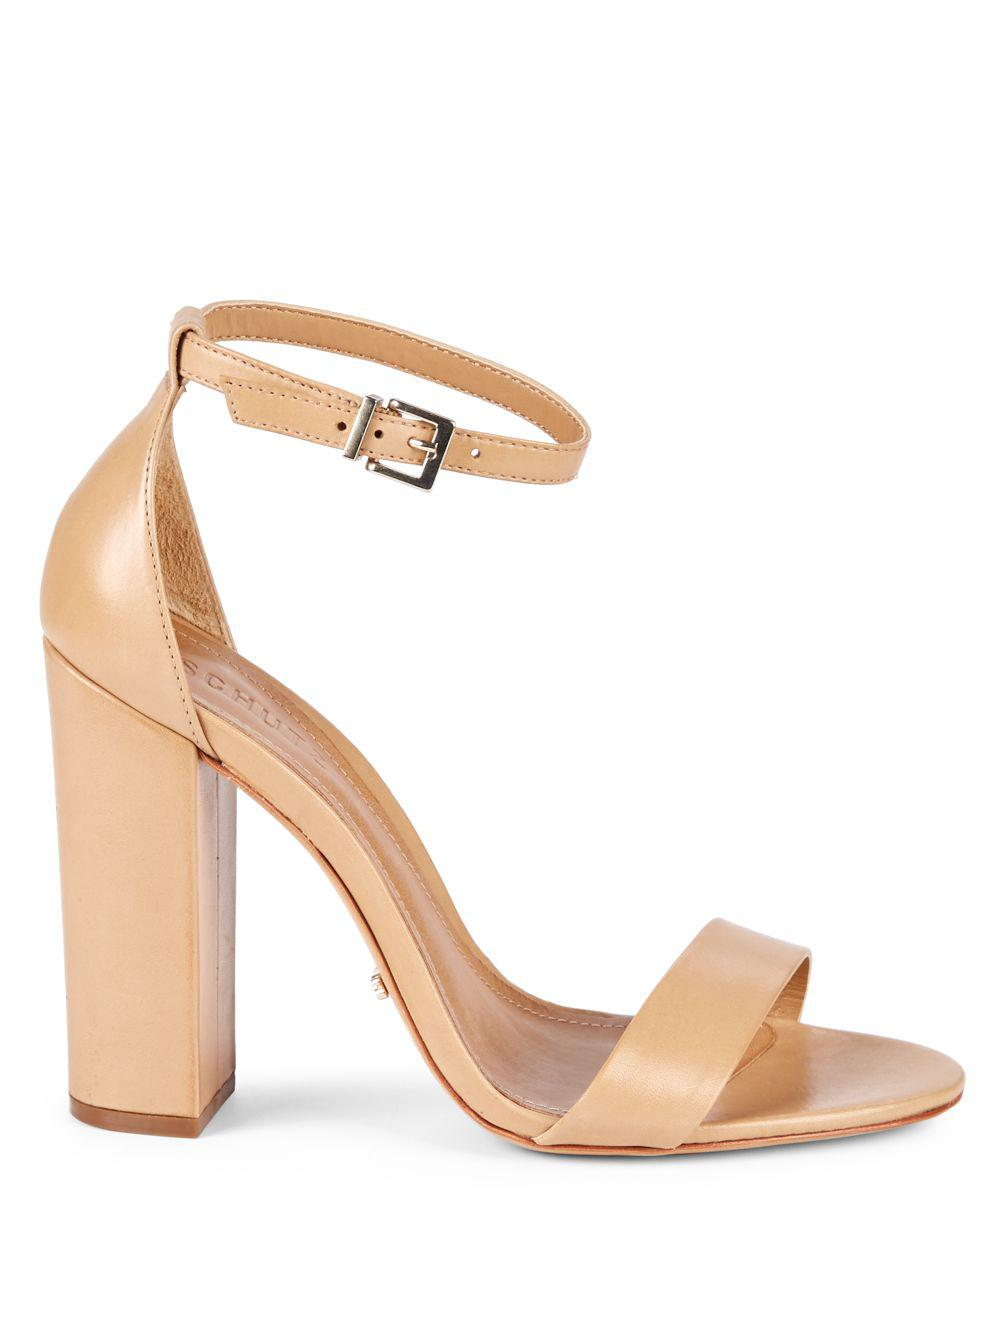 88c9f56e14f7 Lyst - Schutz Enida Leather Ankle-strap Sandals